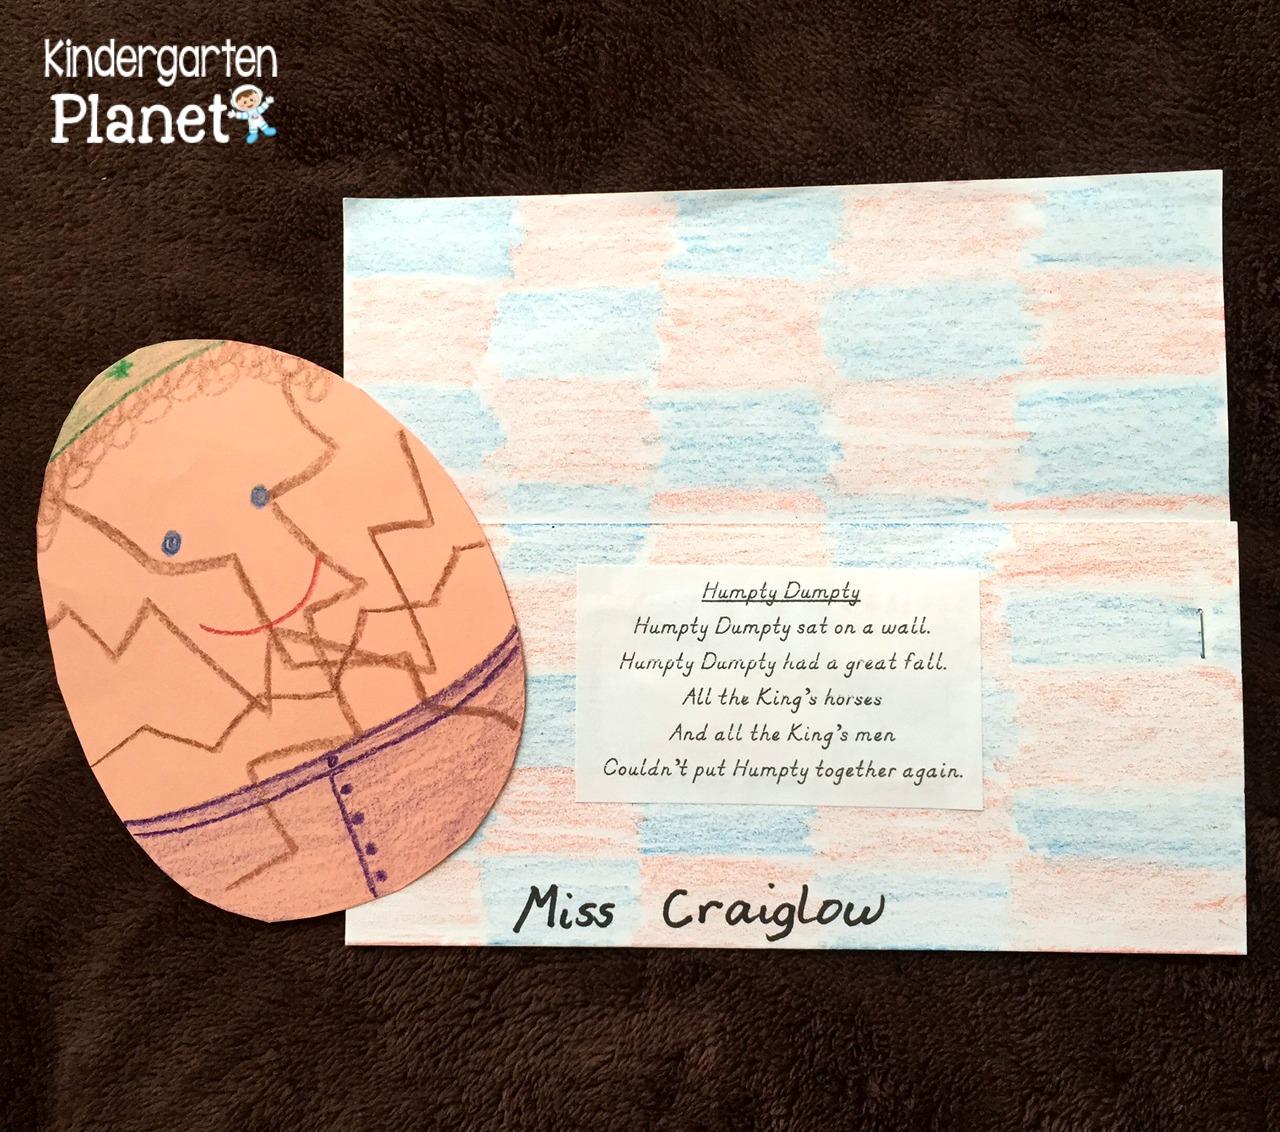 Kindergarten Planet Book Bash